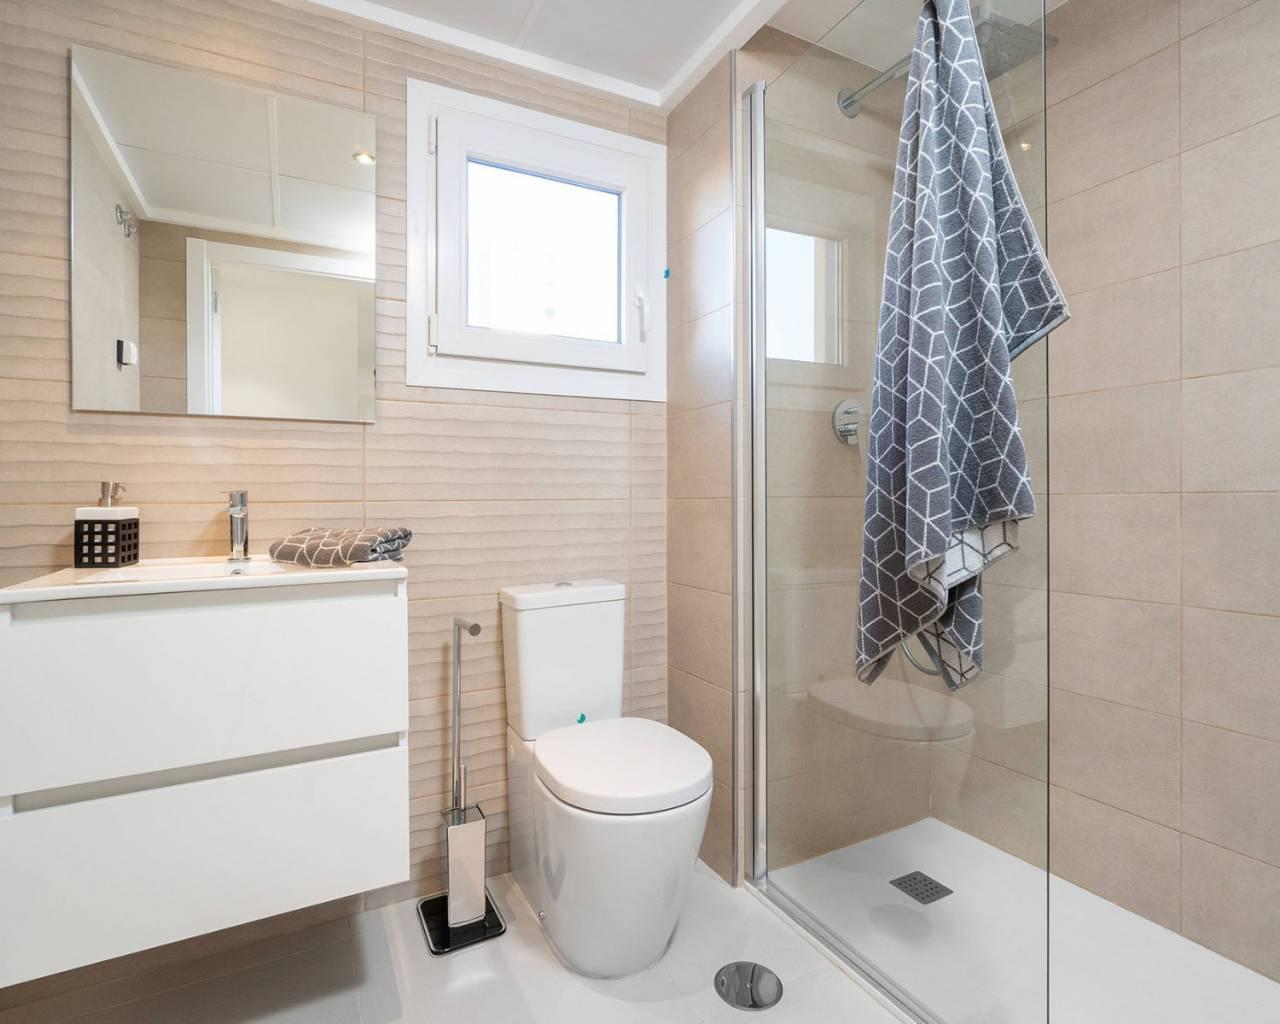 nieuwbouw-appartement-torrevieja-punta-prima_2894_xl